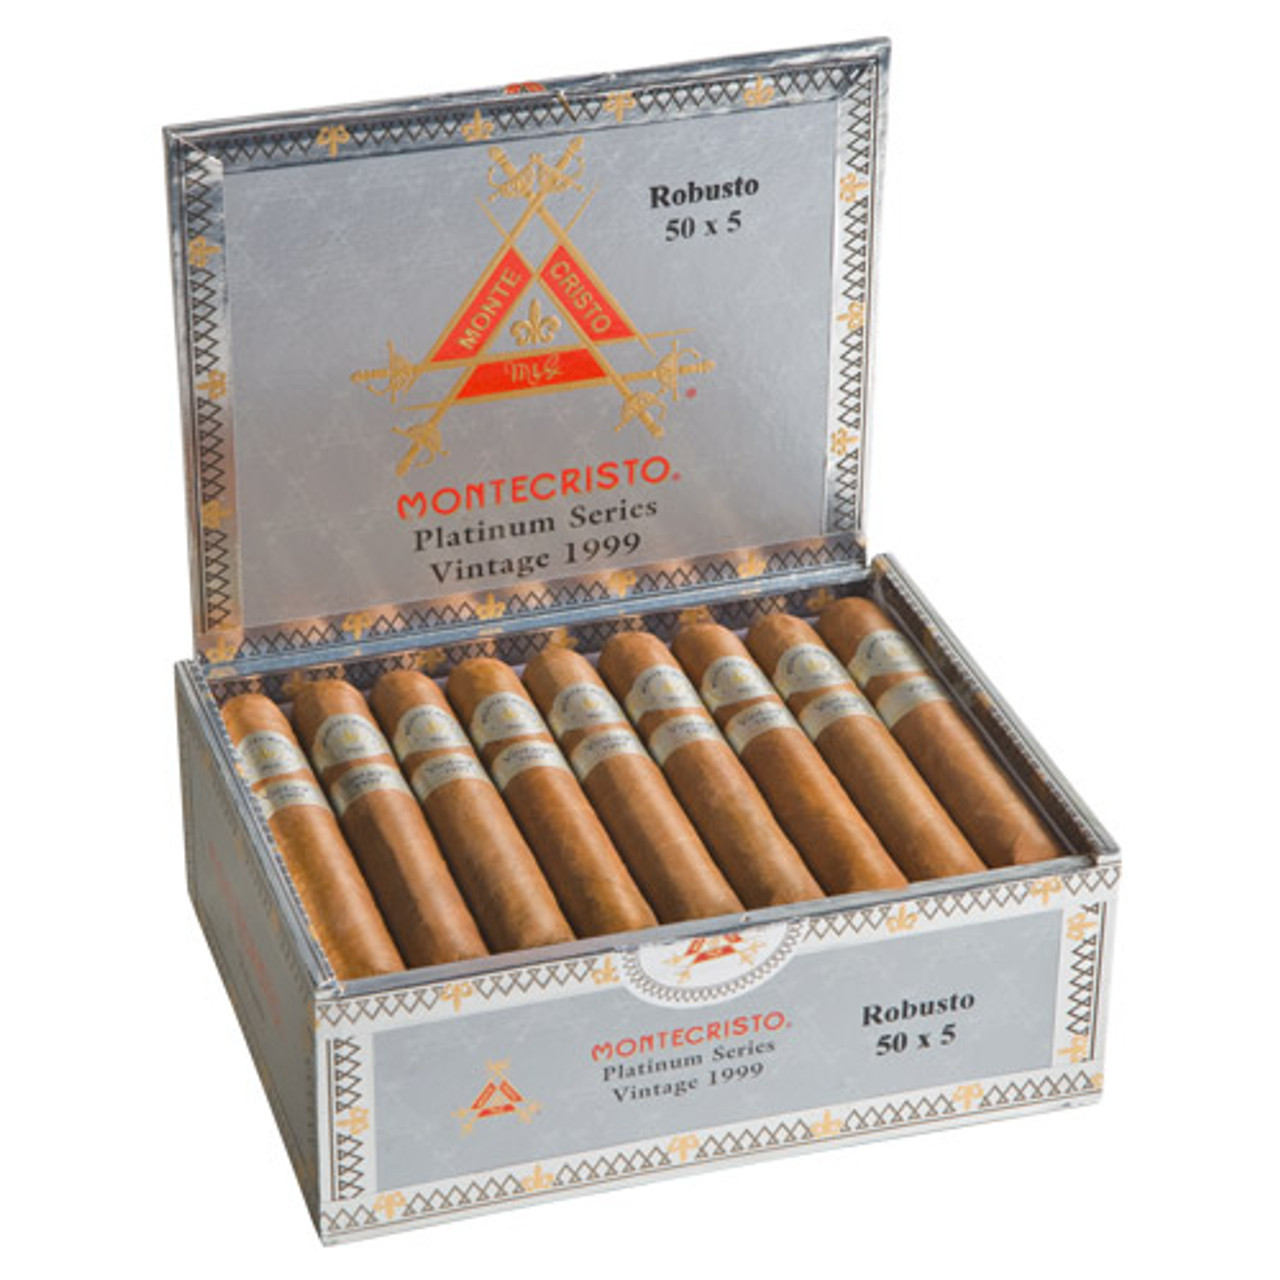 Montecristo Platinum Series Habana No. 2 Belicoso Cigars - 6.12 x 52 (Box of 27)